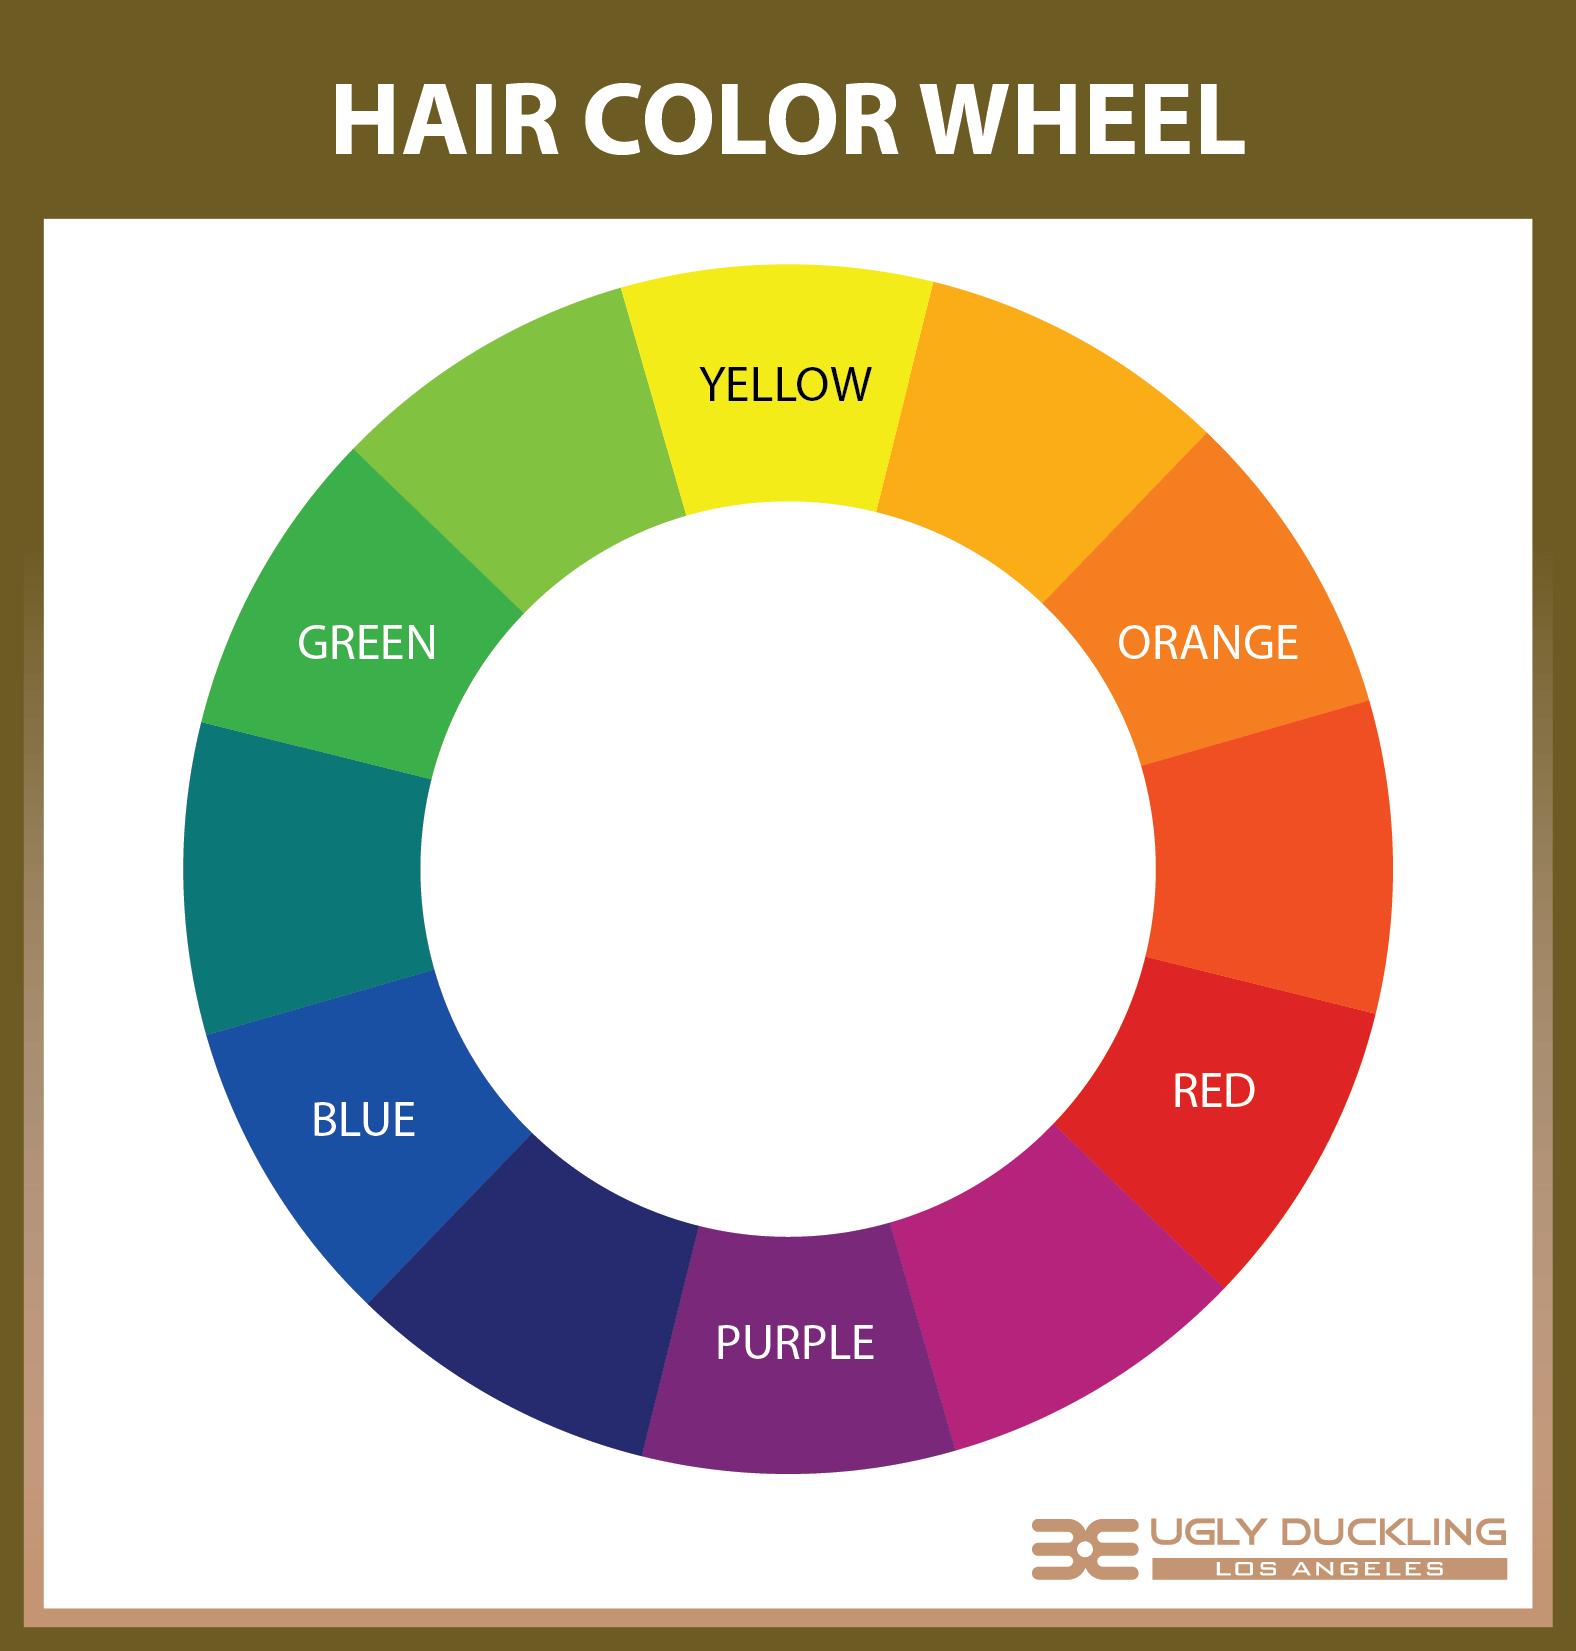 The Hair Color Wheel